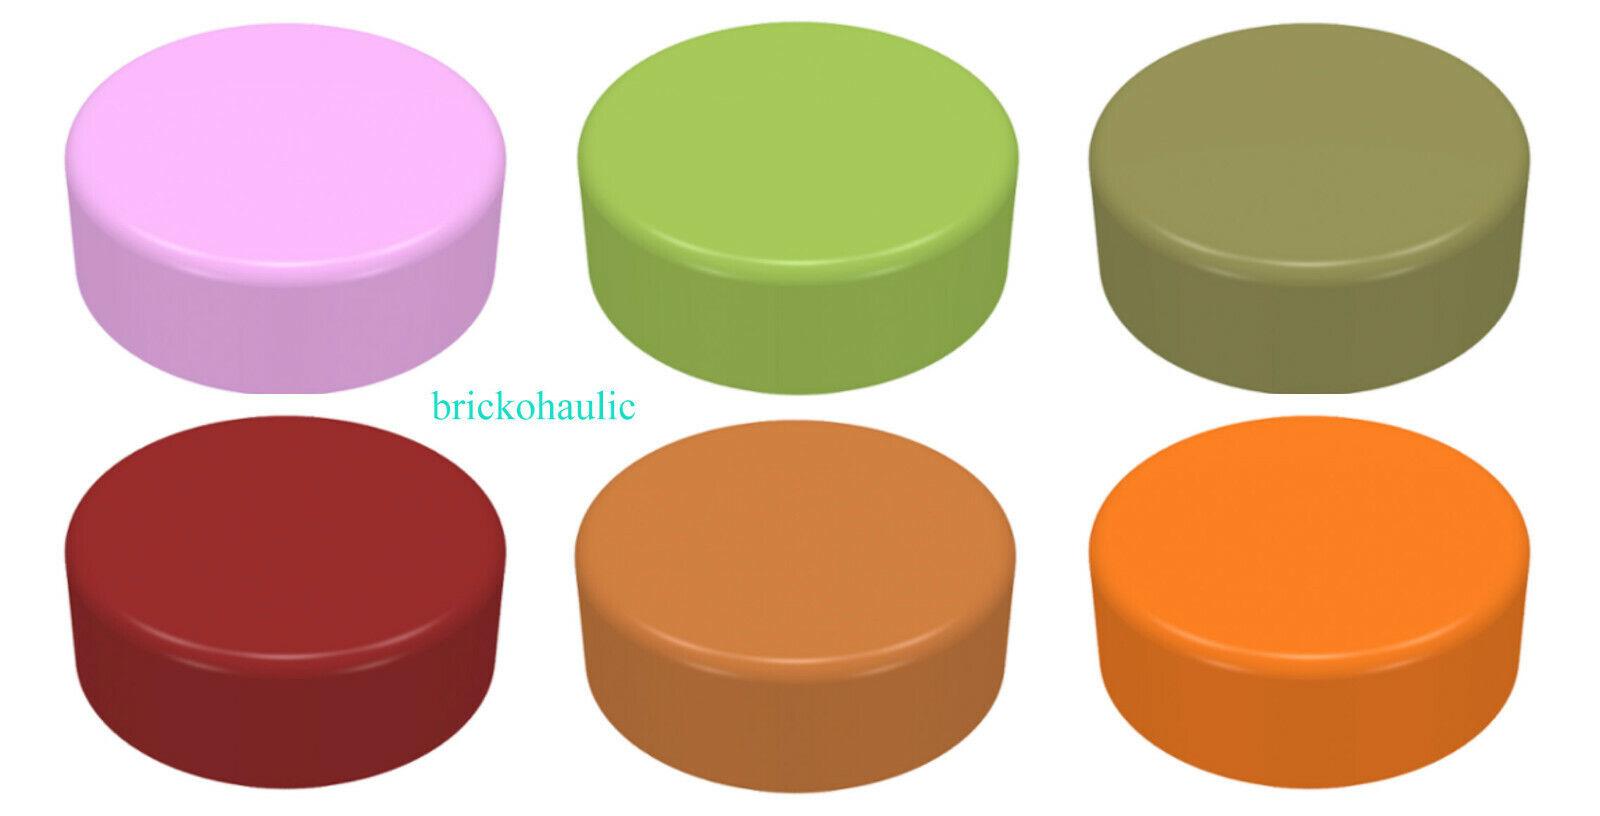 4x tile round 1x1 smooth round plate orange 98138 new Lego